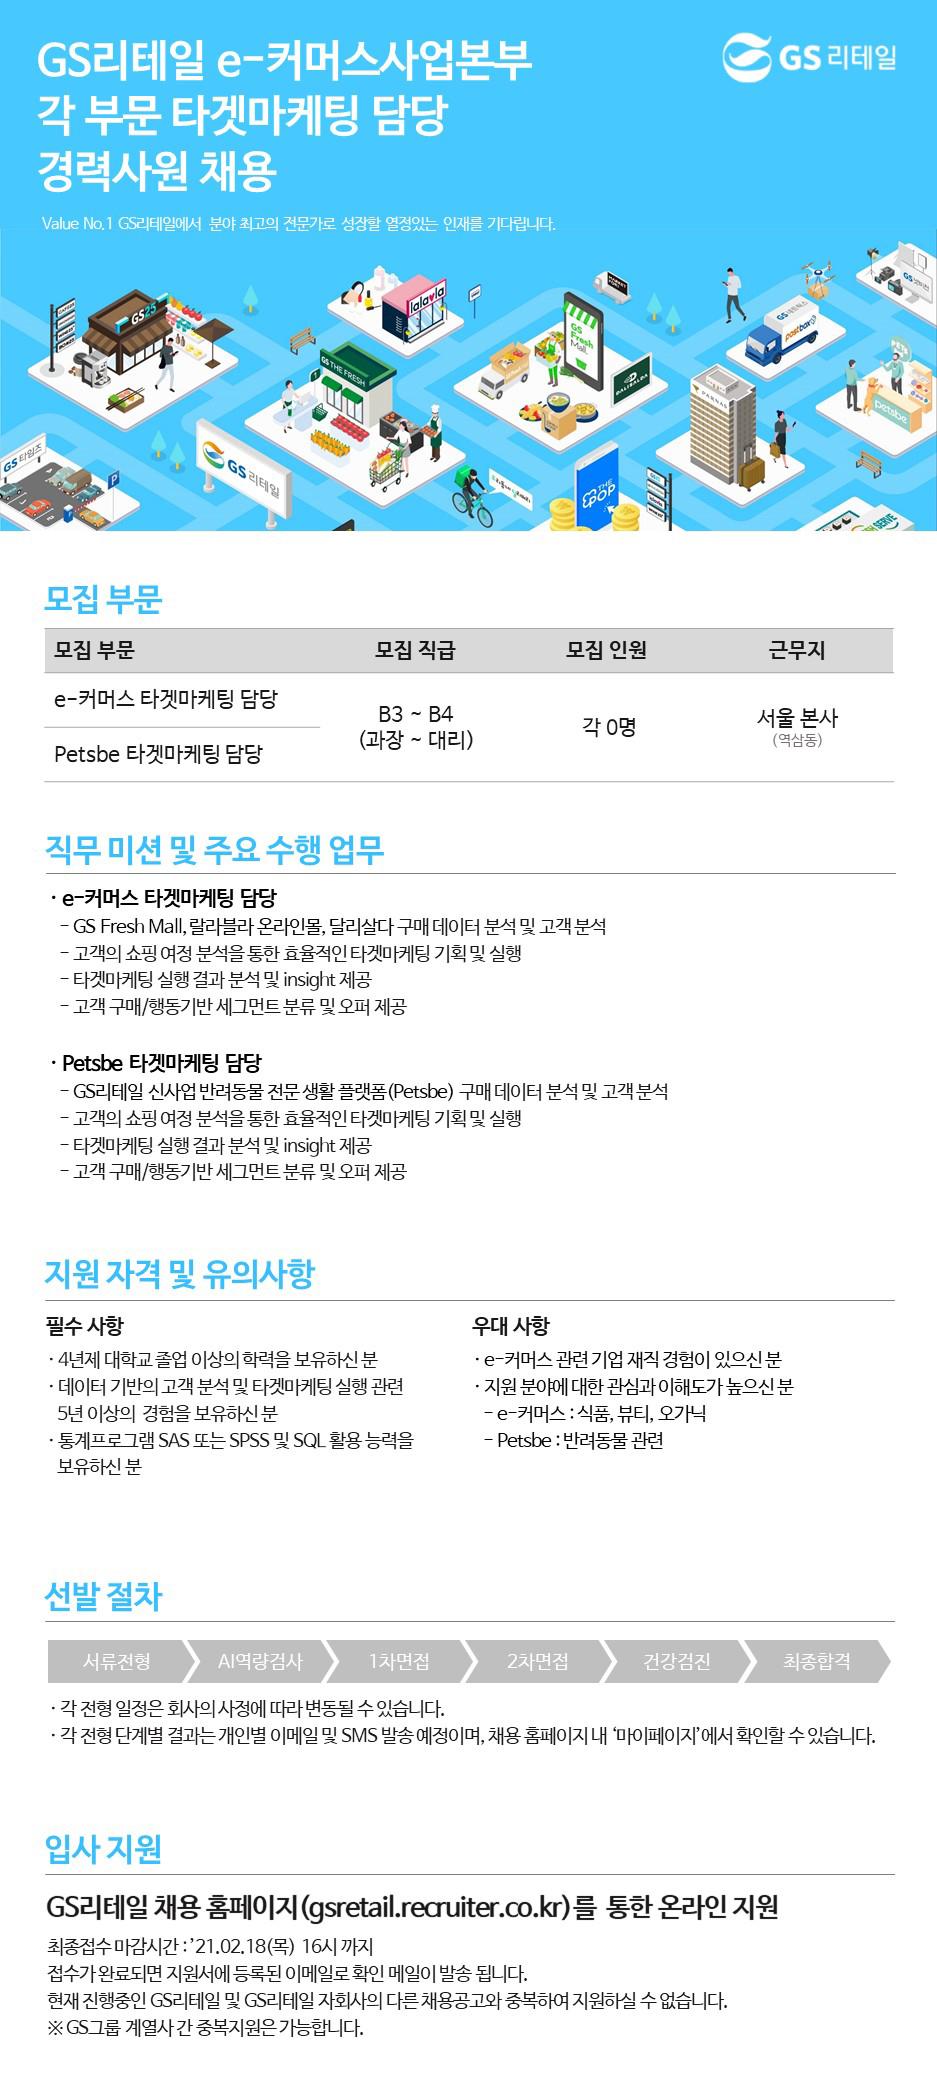 ㈜GS리테일 e-커머스사업본부 각 부문 타겟마케팅 담당 경력사원 채용